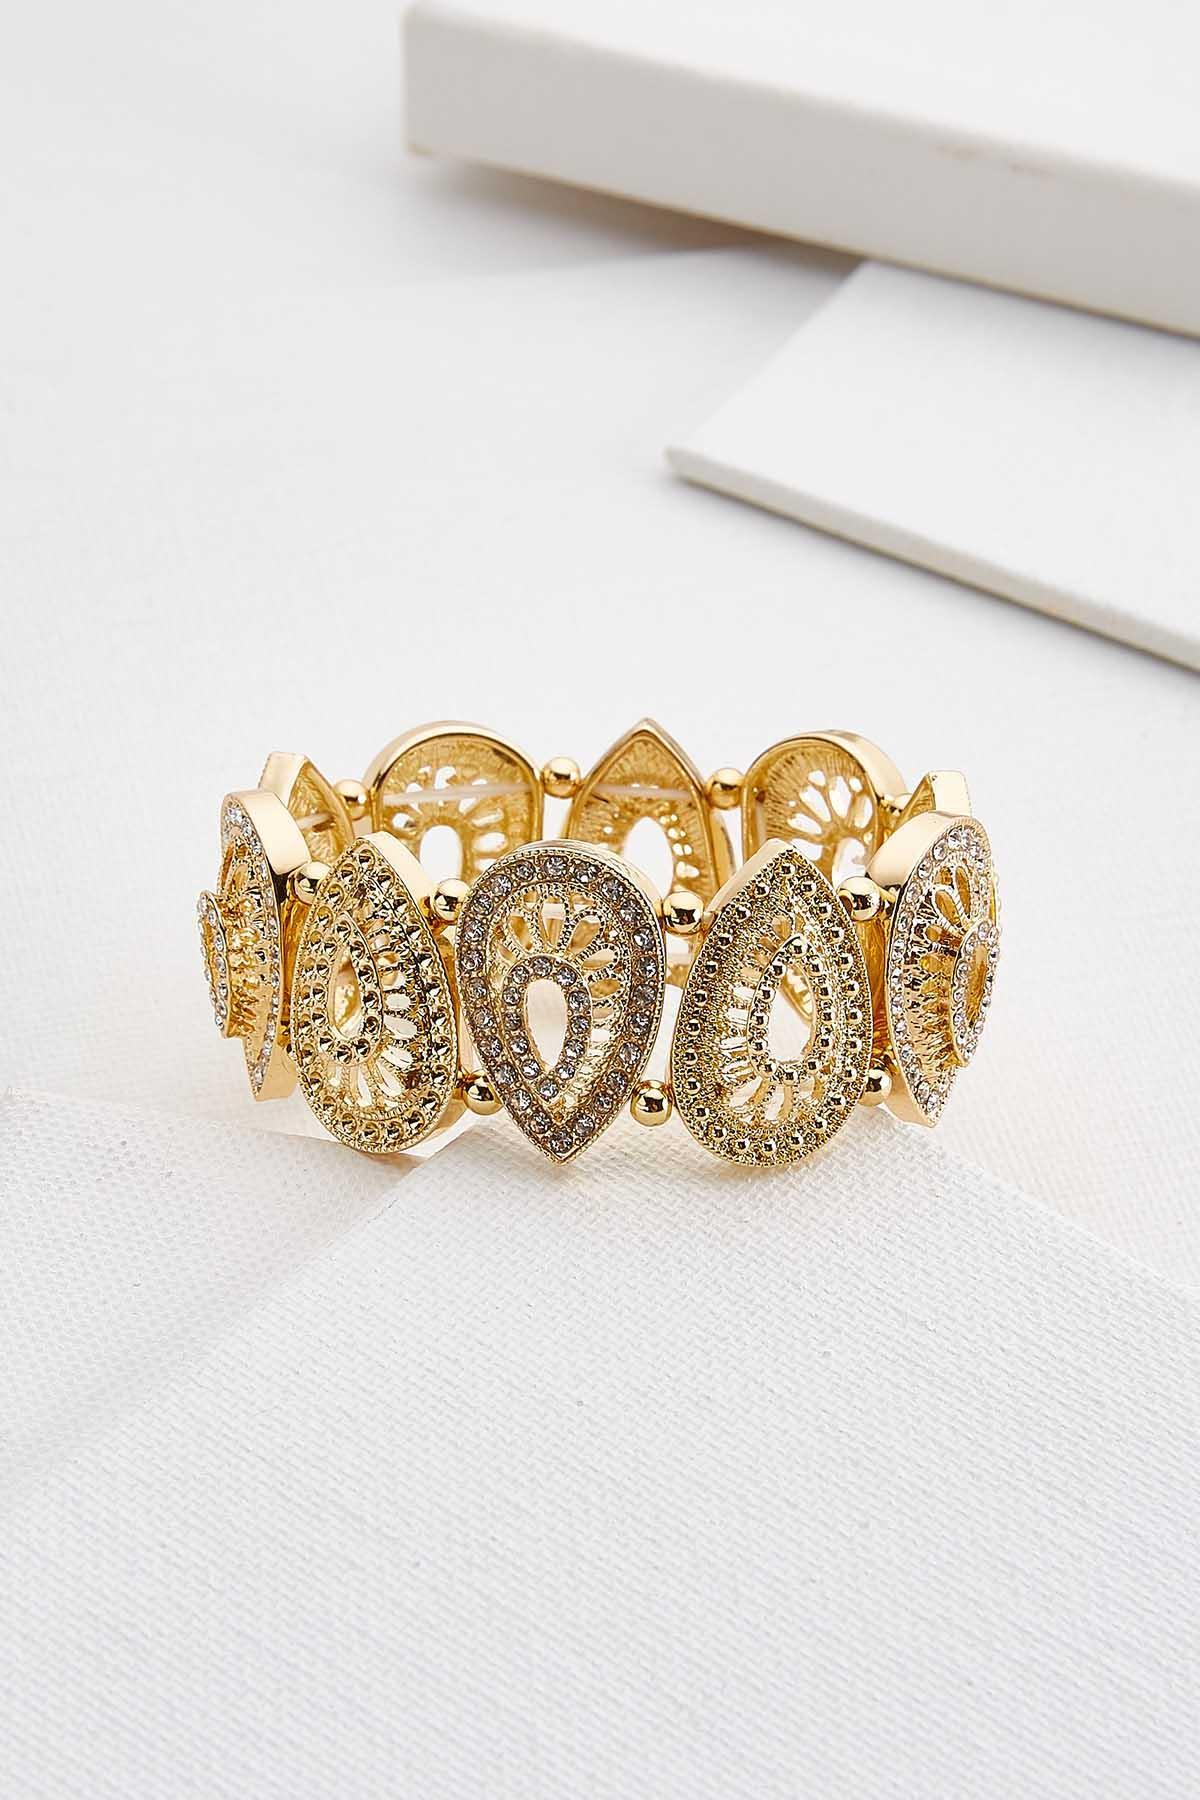 Filigree Rhinestone Stretch Bracelet